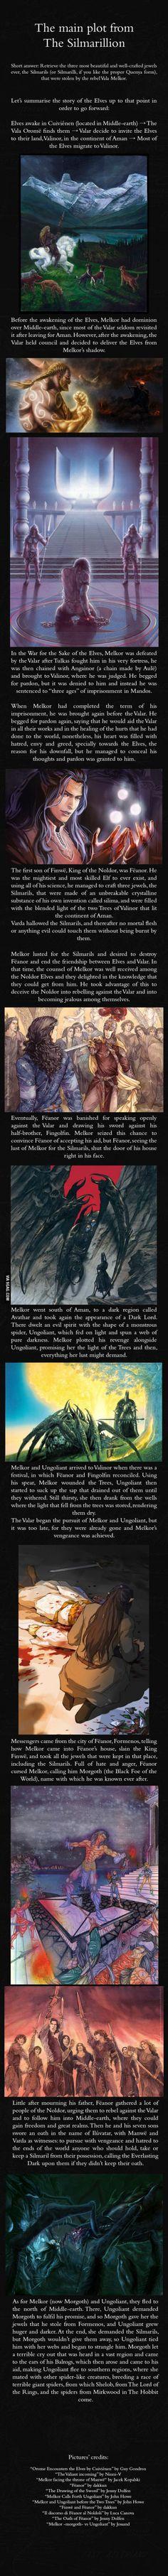 Kind of a brief prelude.  The Silmarillion main plot - J.R.R. Tolkien's Mythology